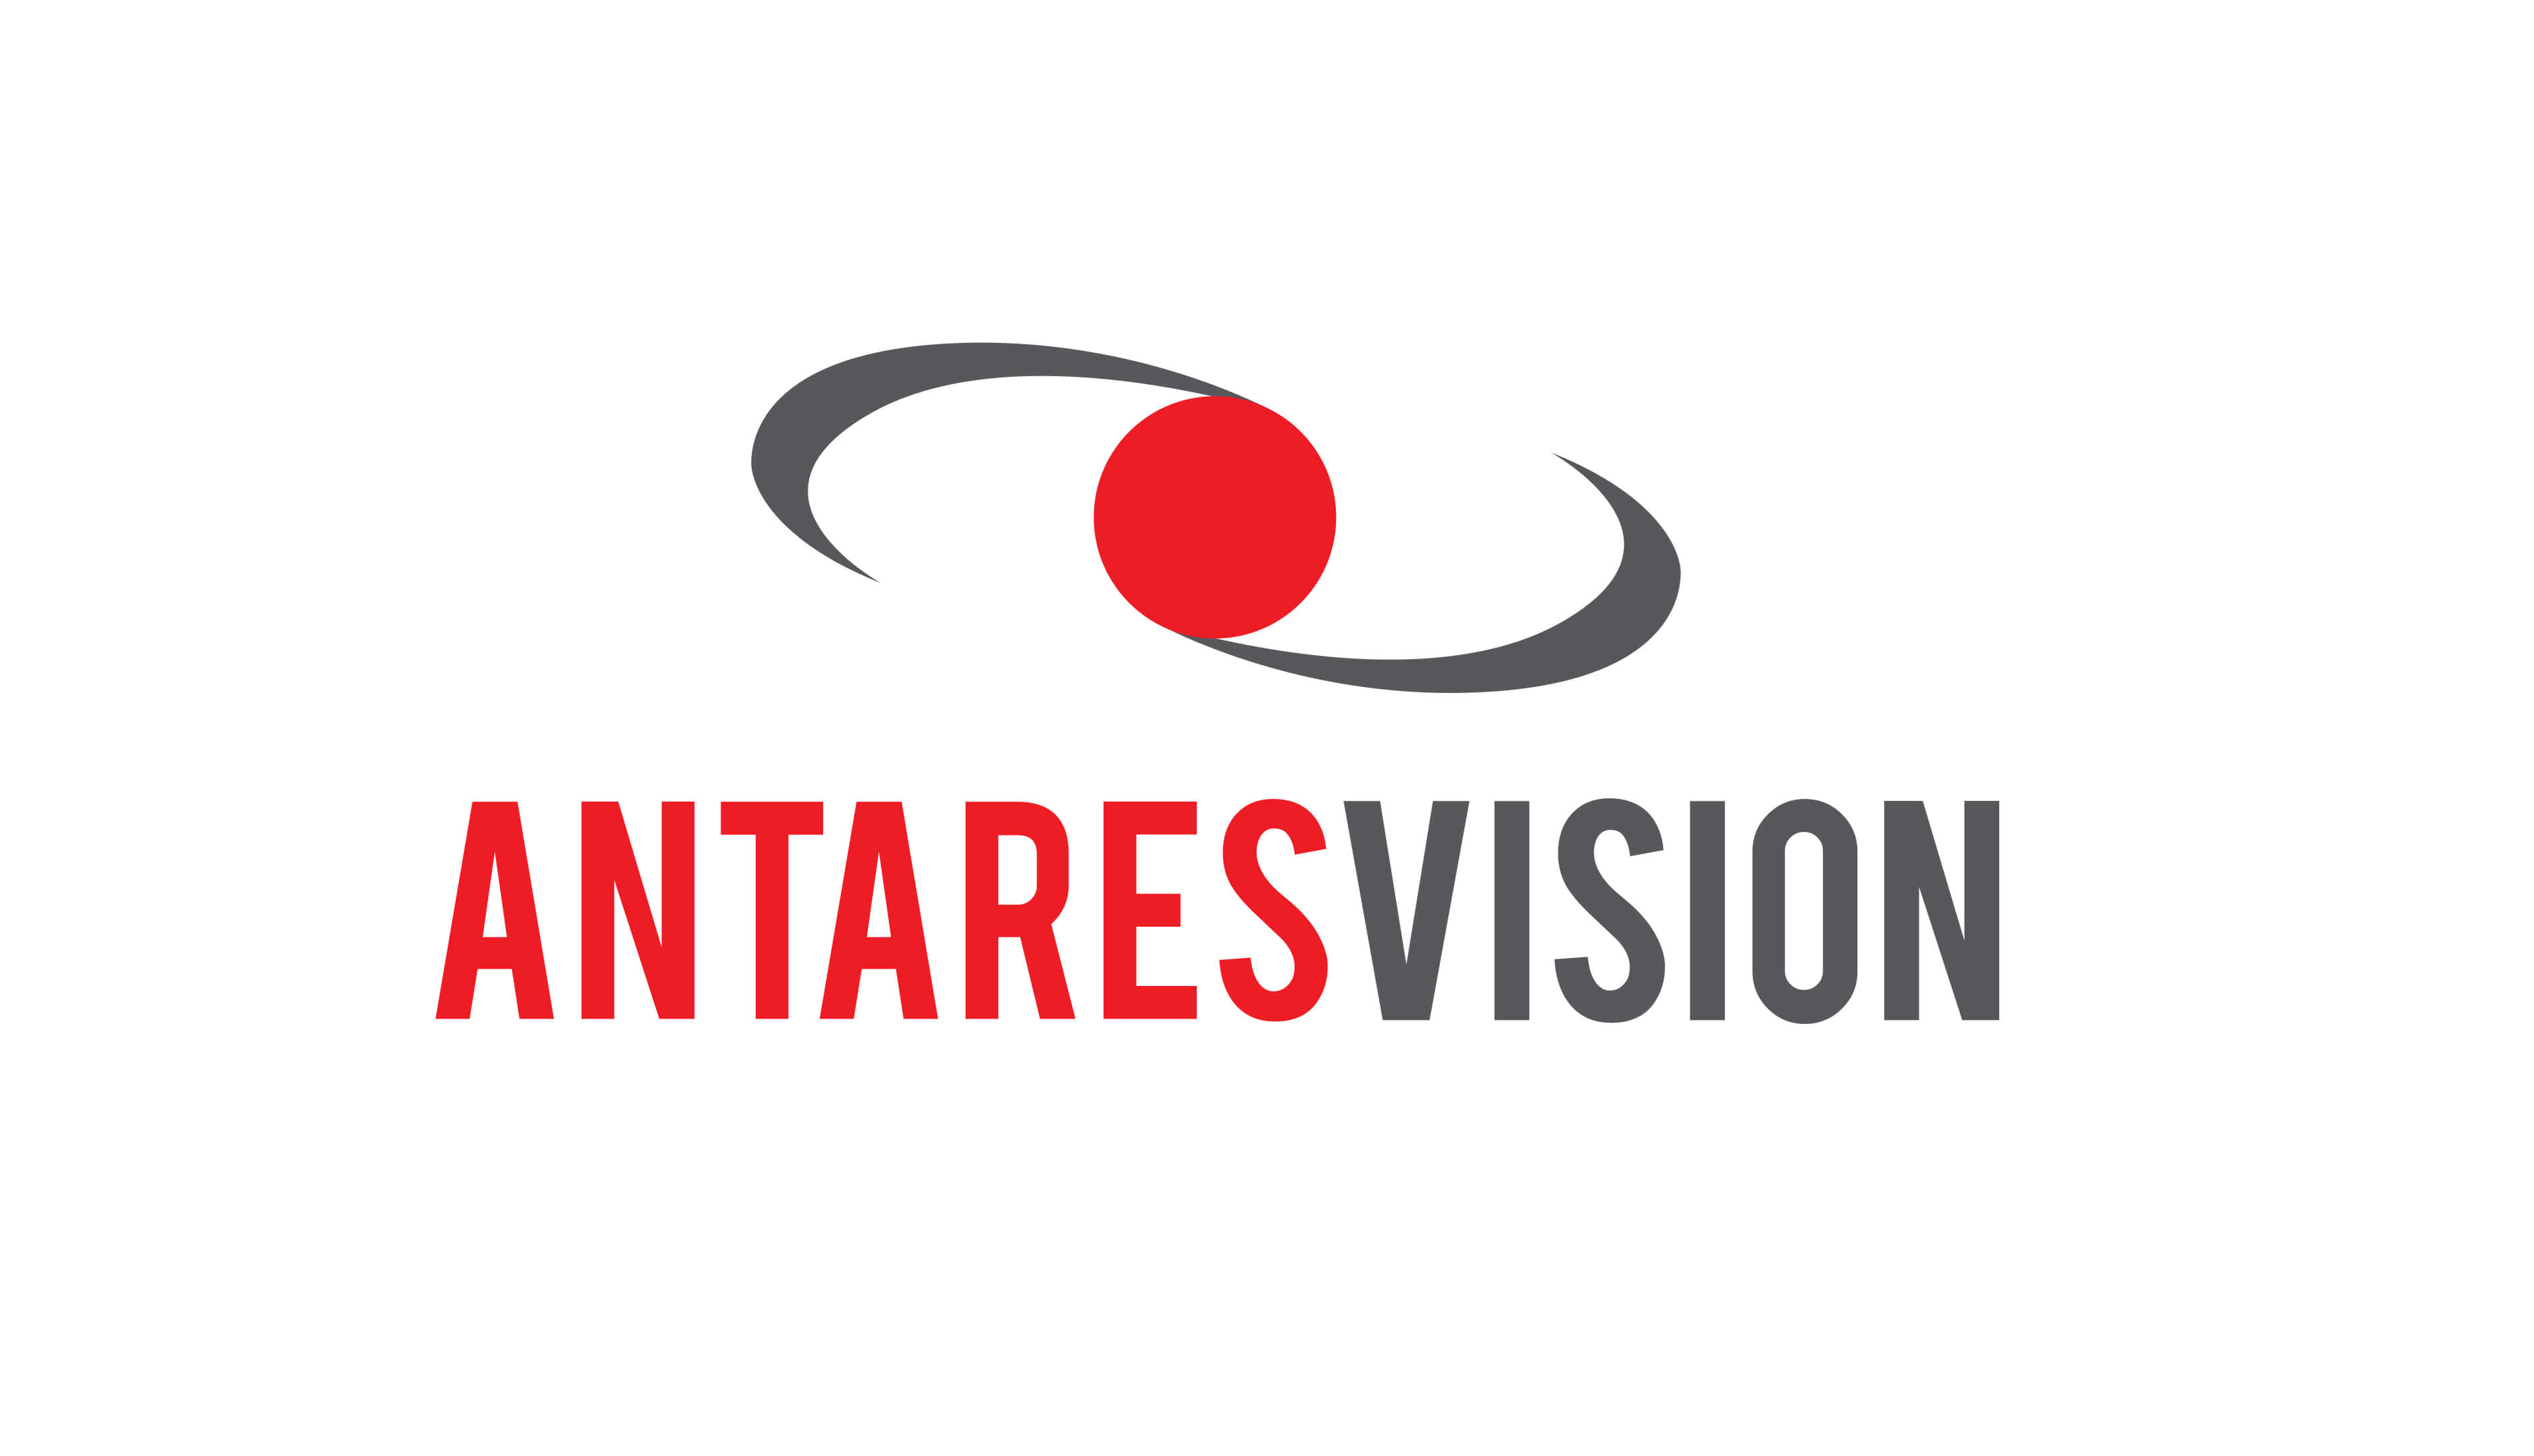 AntaresVision